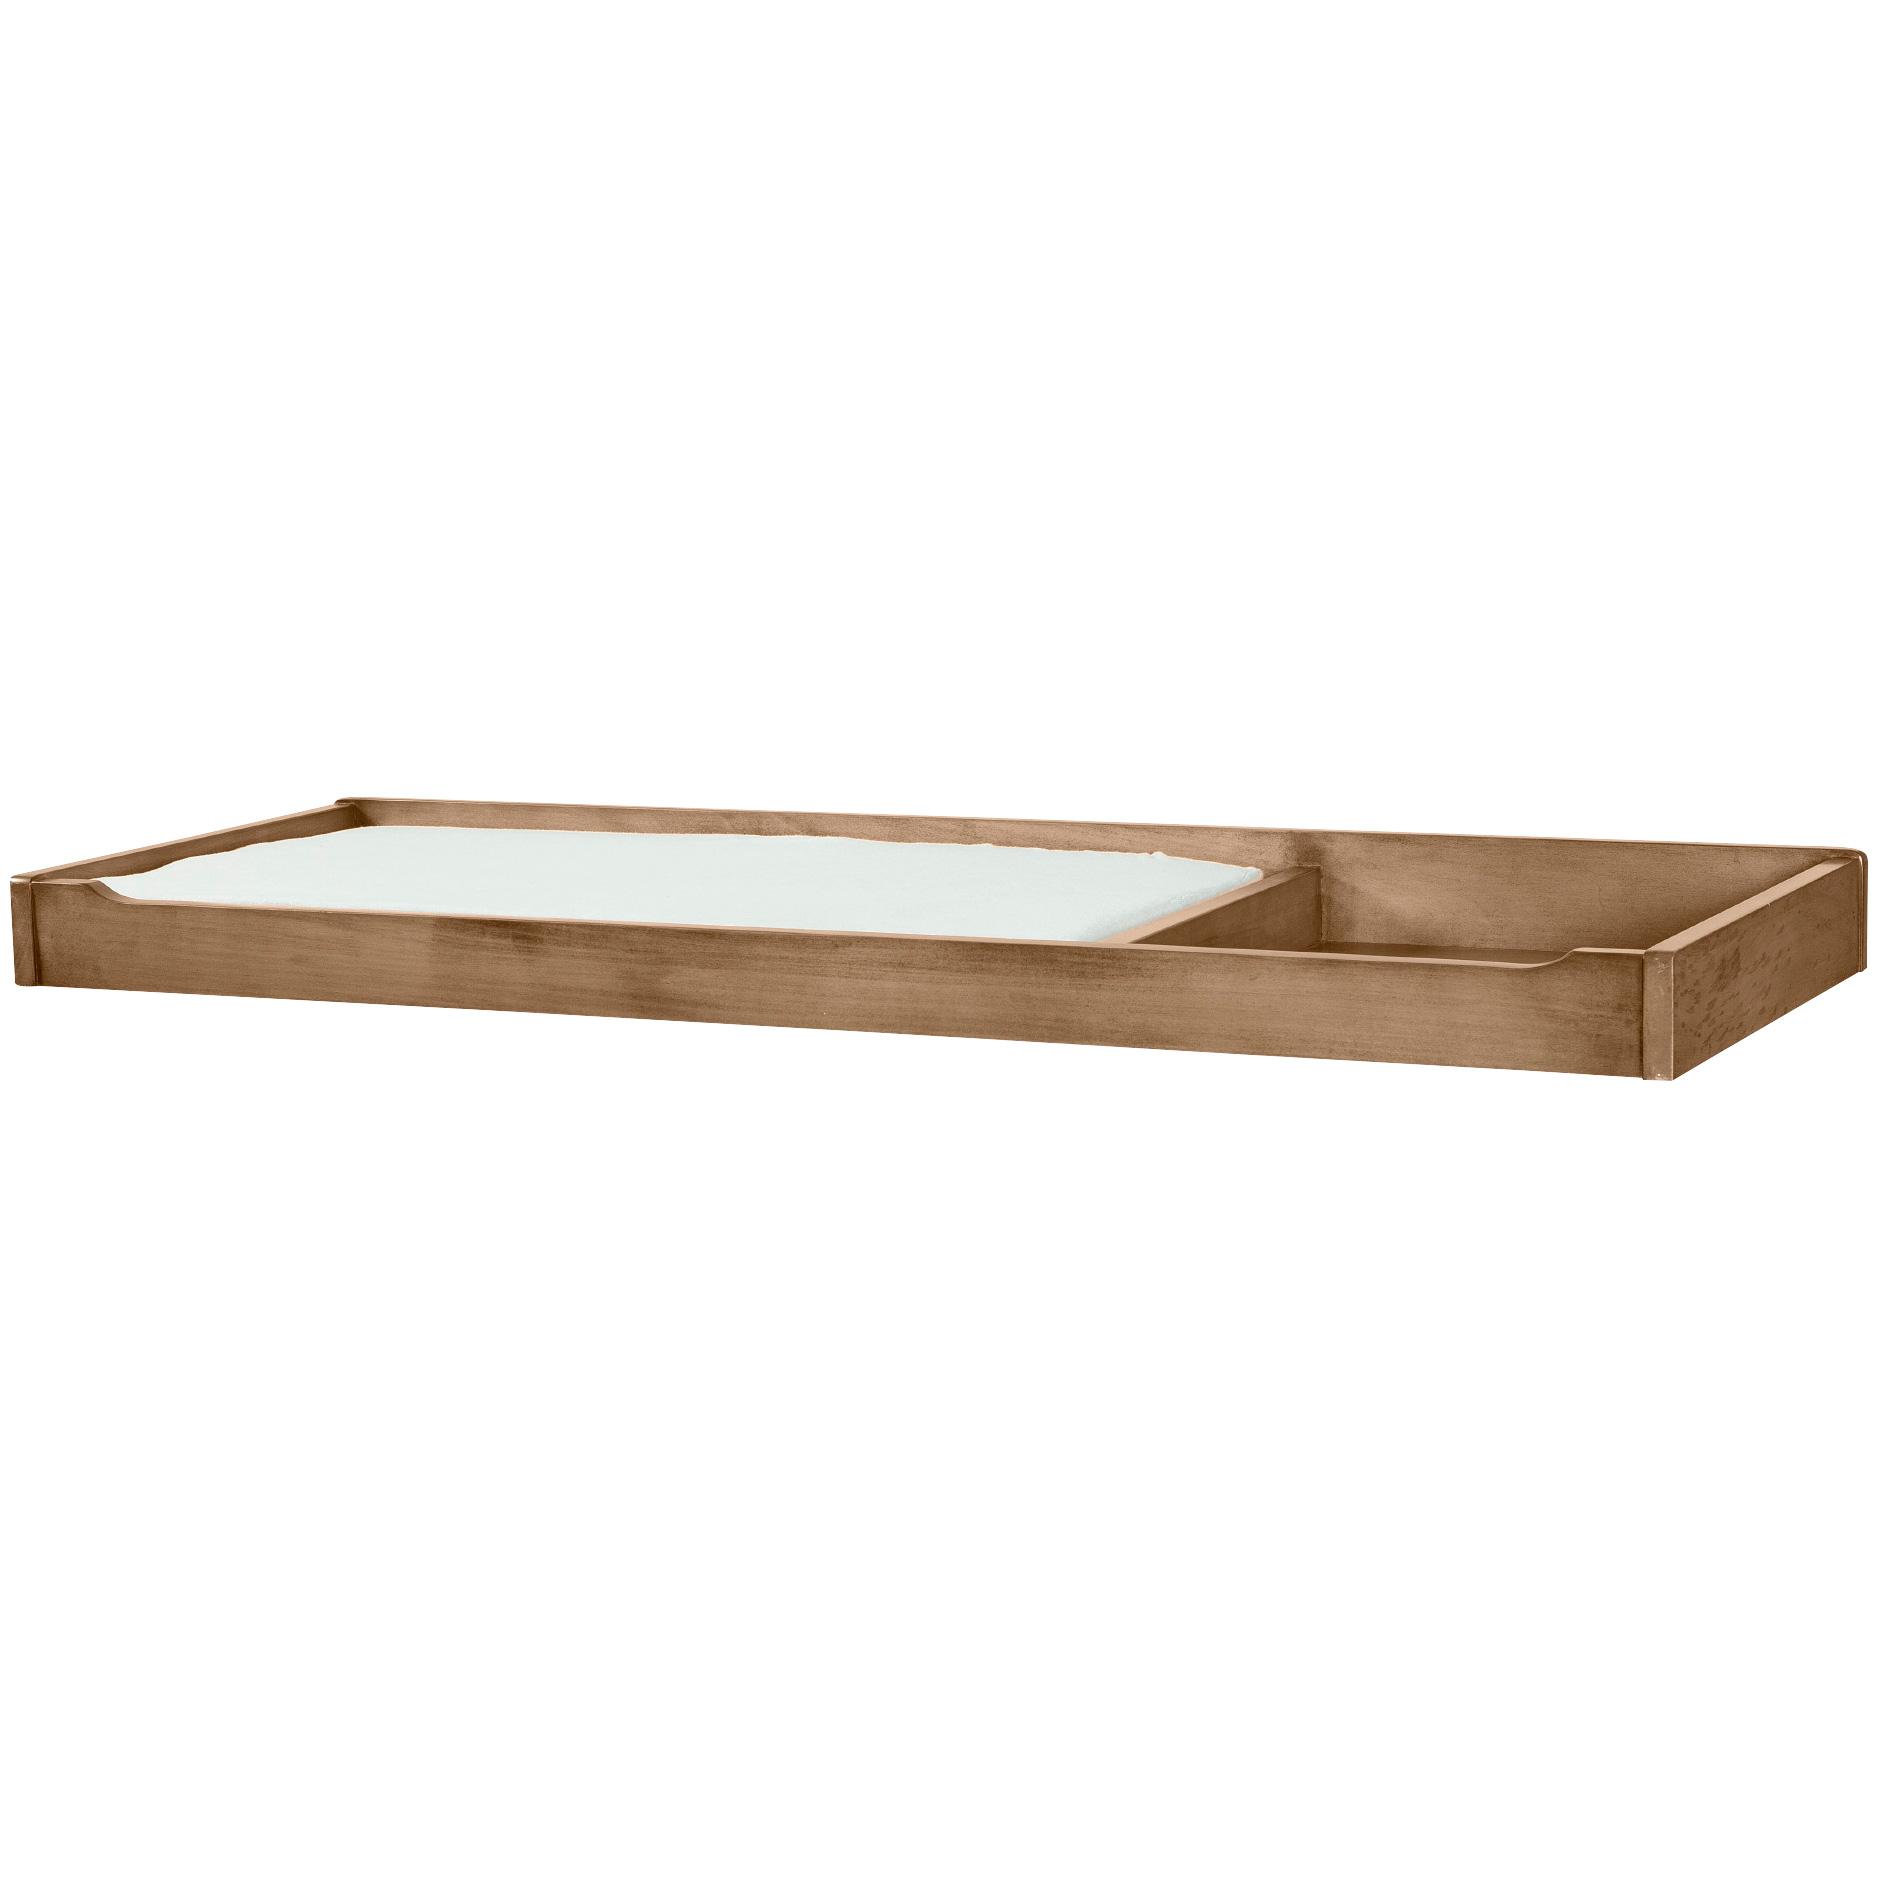 Westwood Design | Pine Ridge Cashew Changer Top